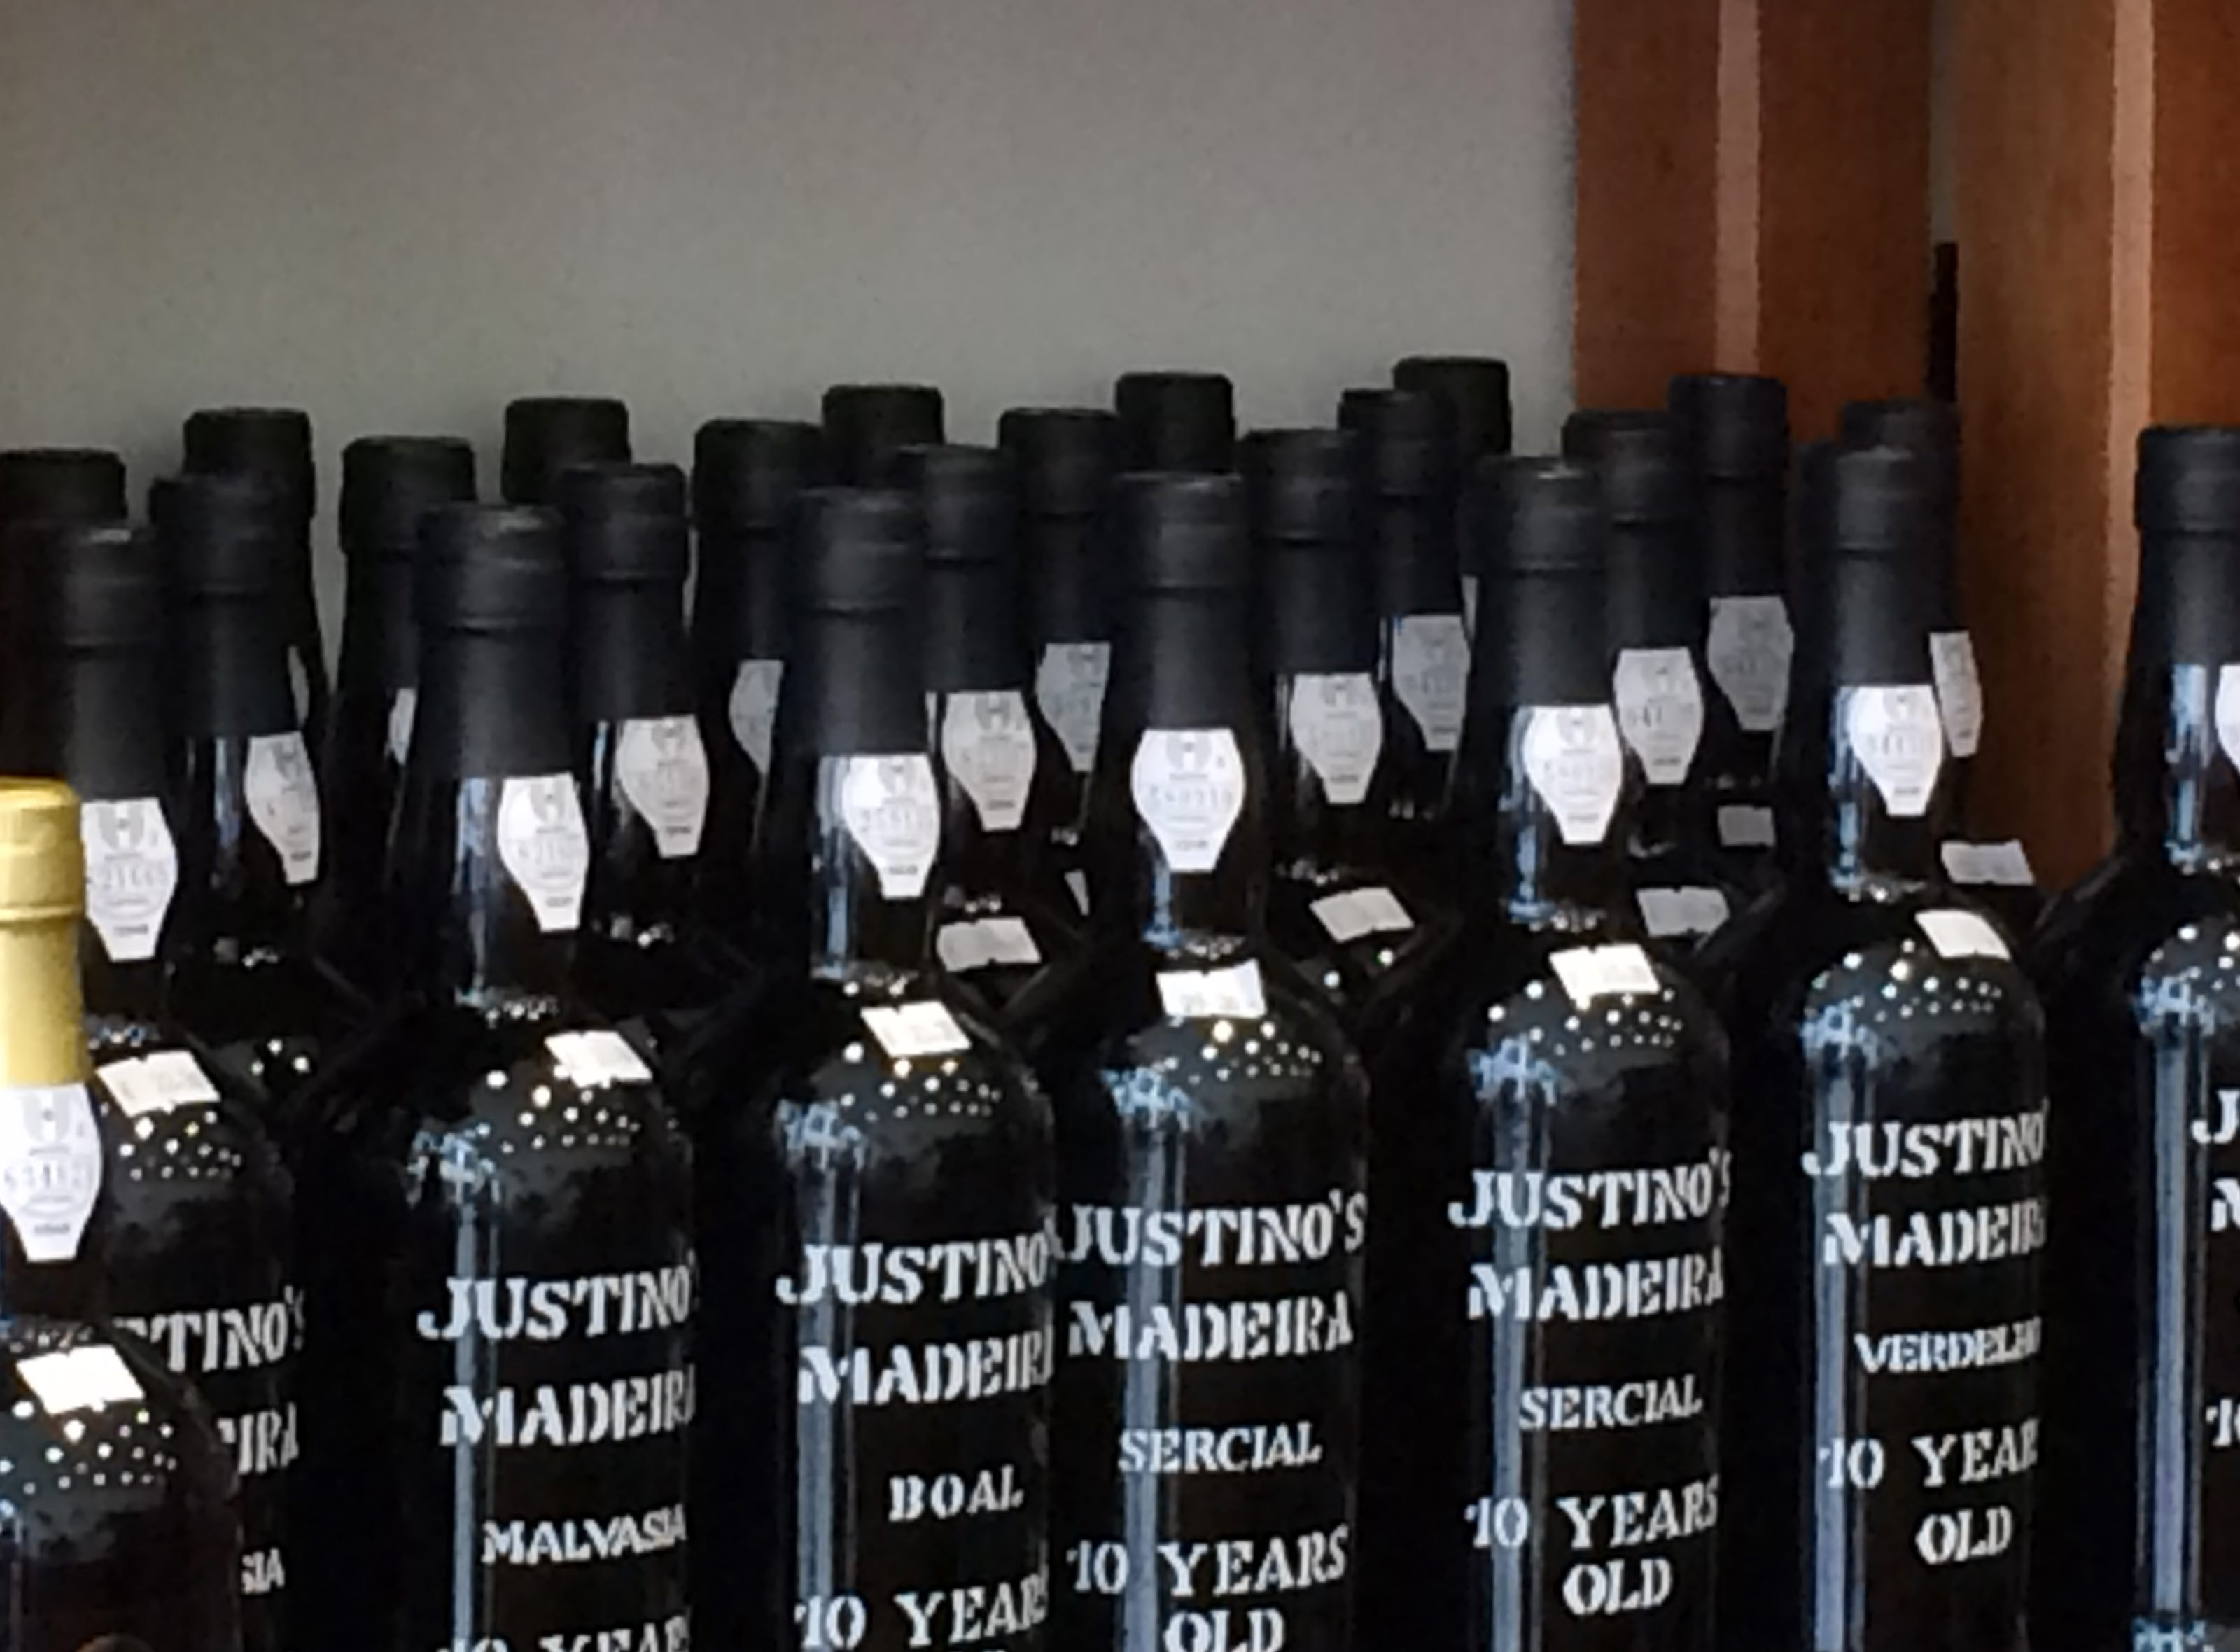 justino's 10 year old sercial Madeira wine